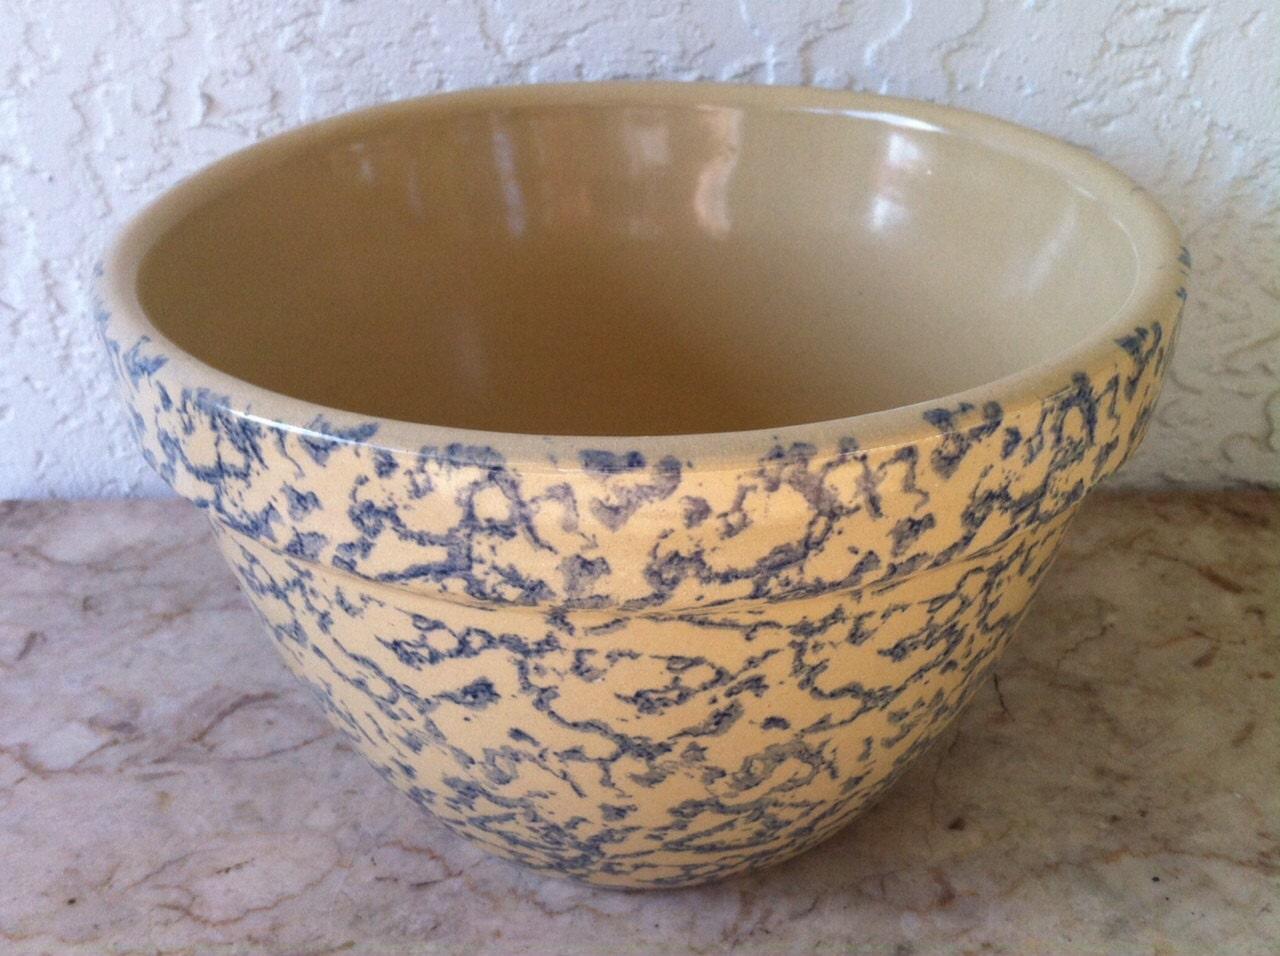 Vintage Kitchen Bowl Pottery Mixing Bowl Rrp Amp Co Robinson